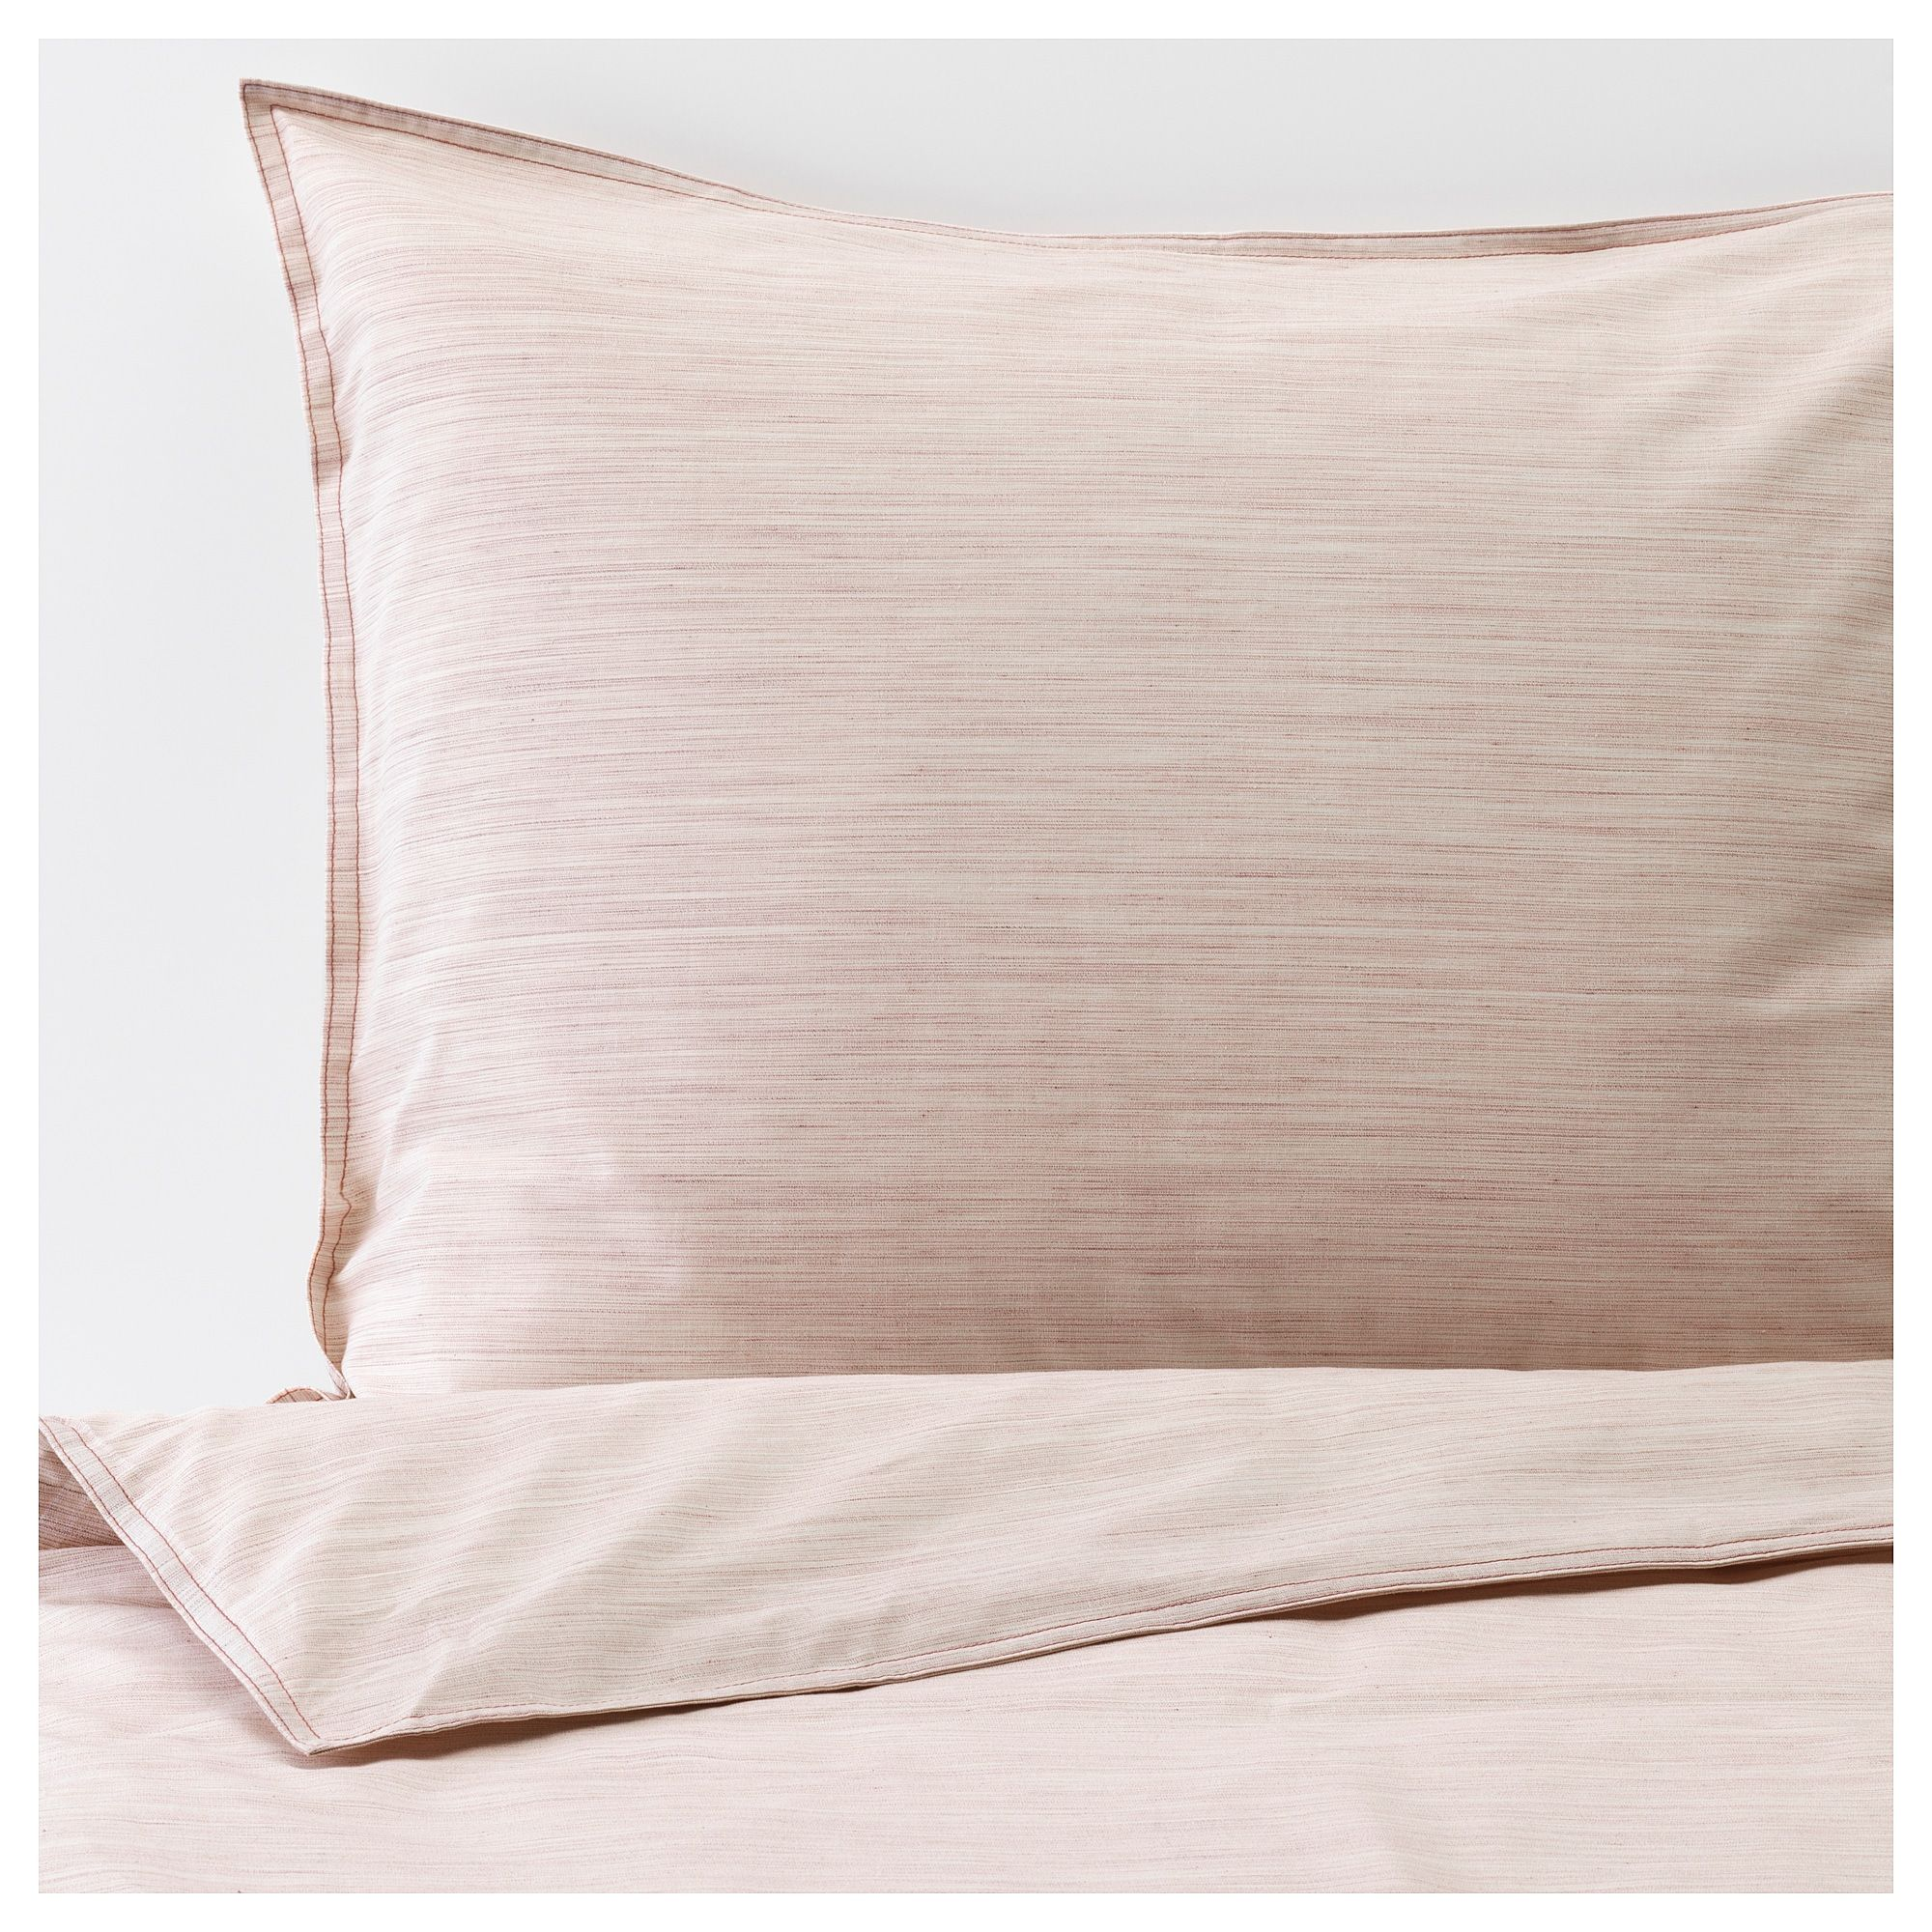 Skogsalm Duvet Cover And Pillowcase S Pink Full Queen Double